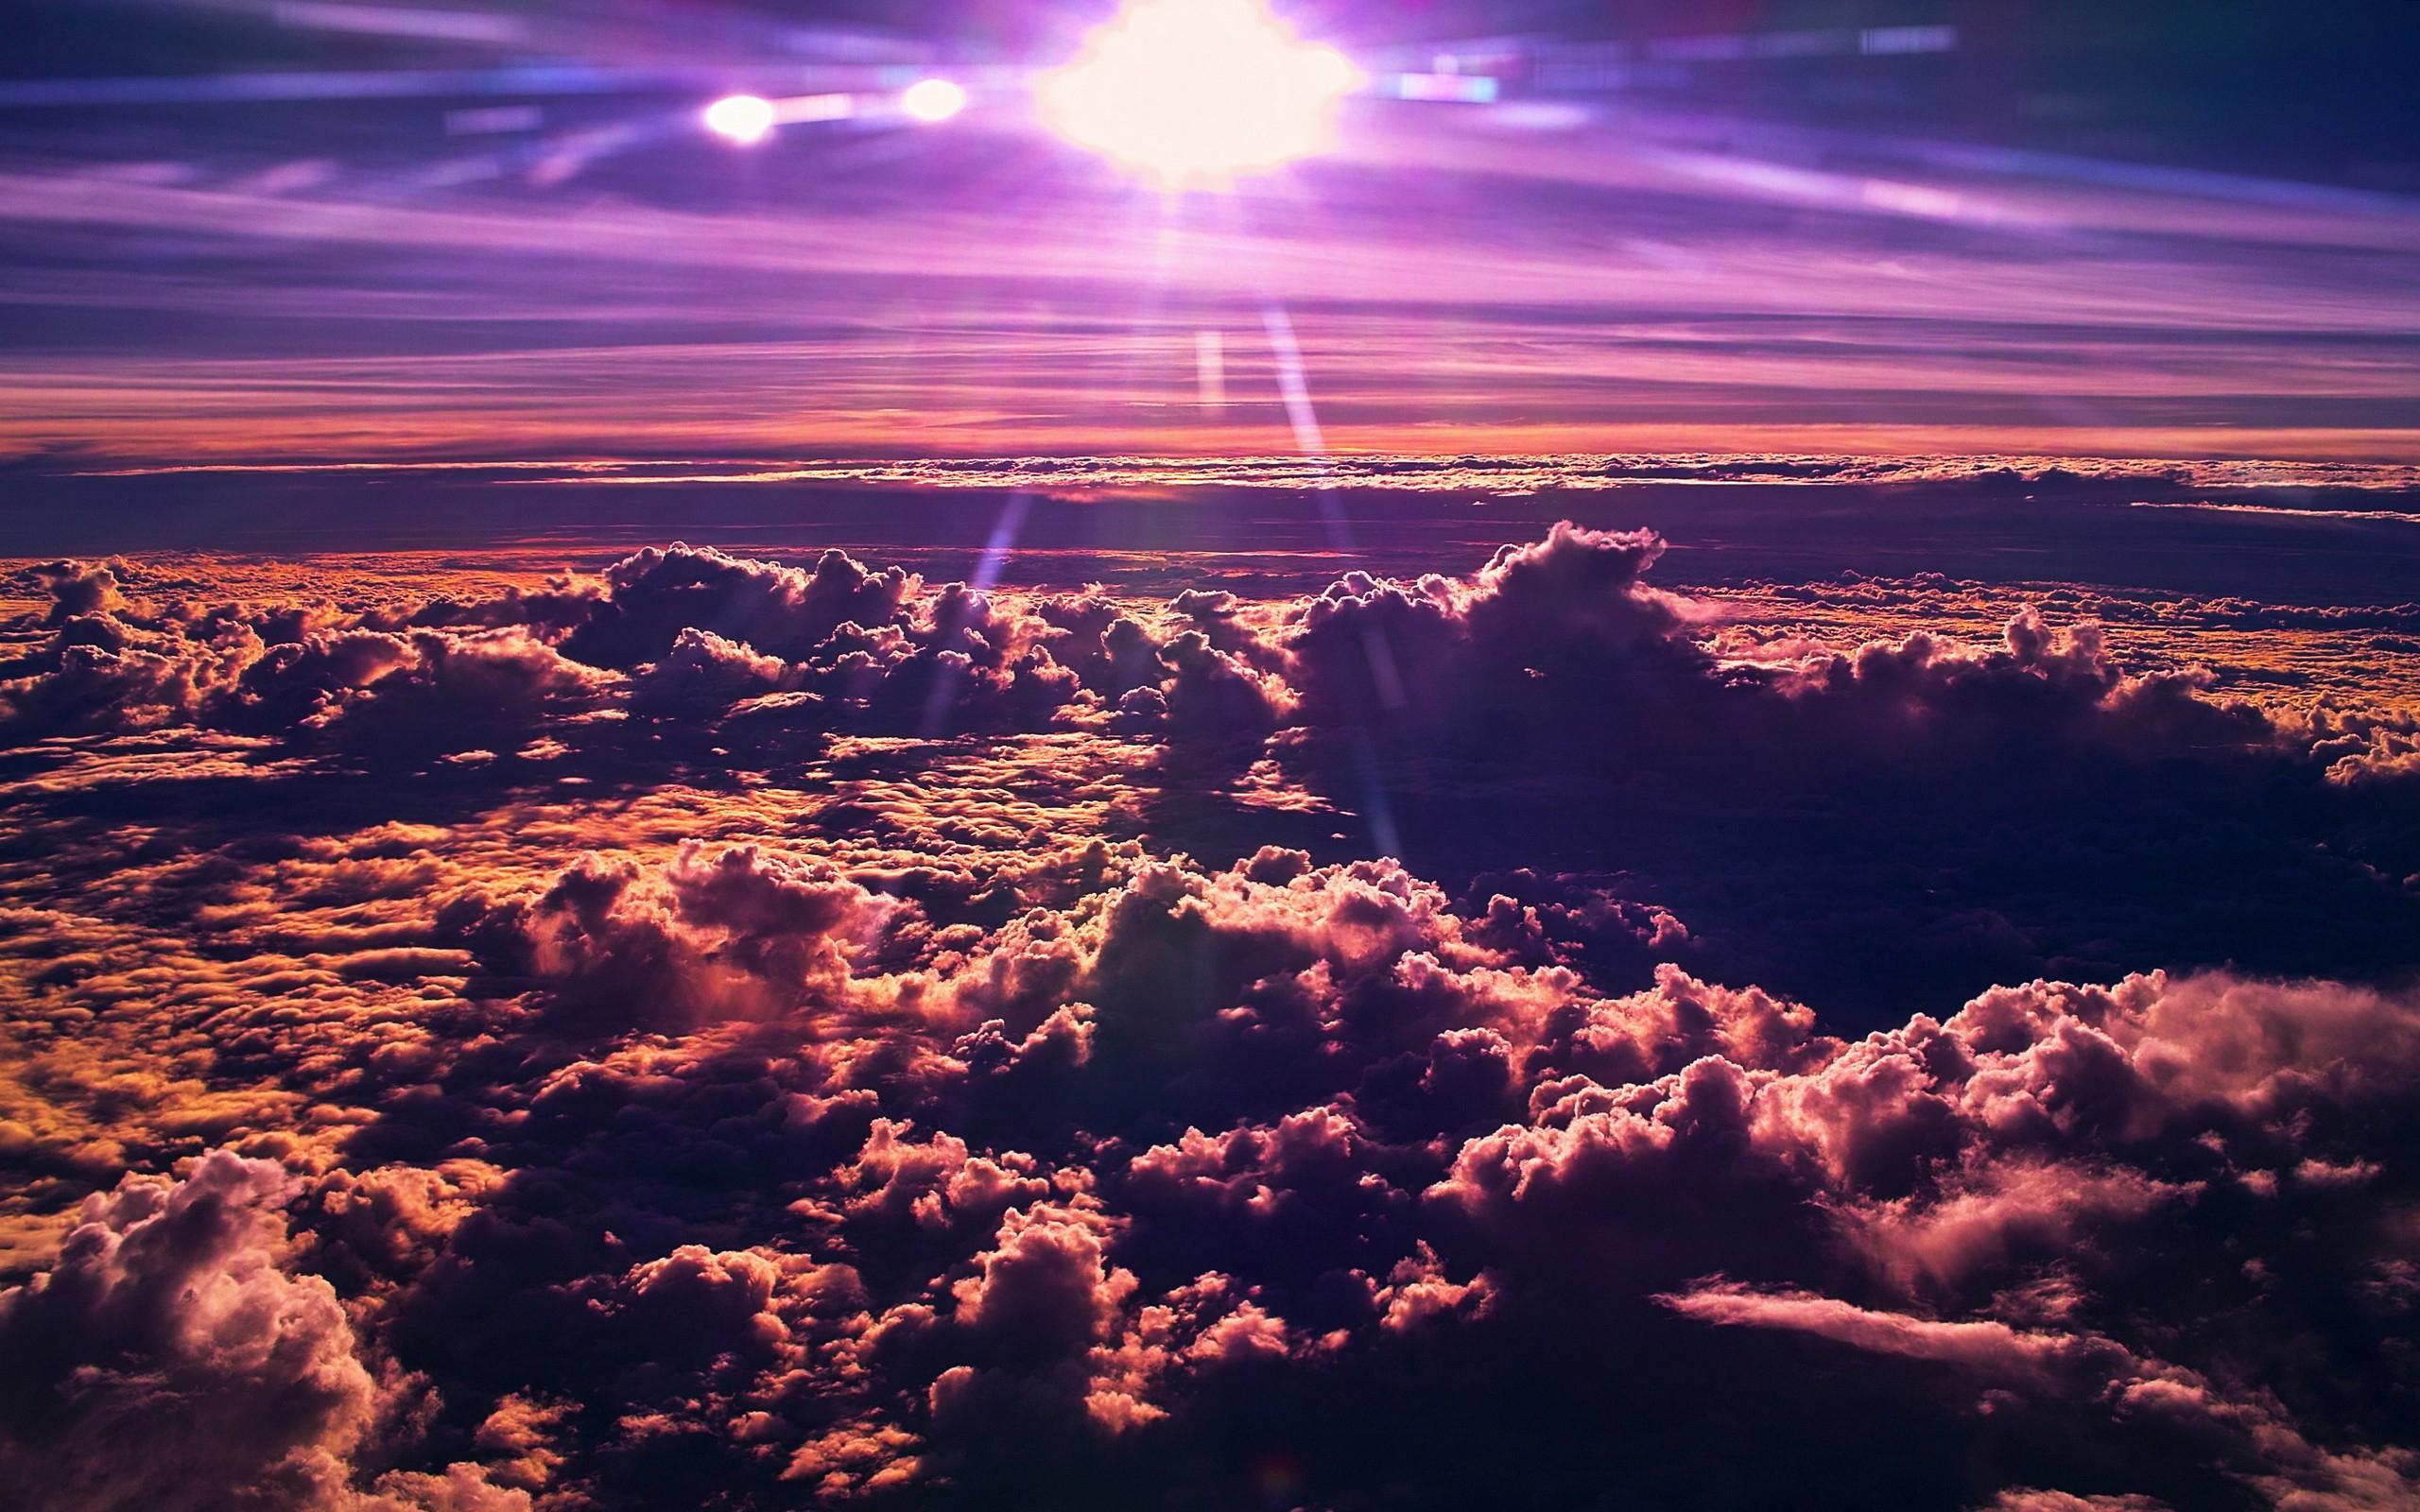 clouds pictures purple  HD Desktop Wallpapers  4k HD